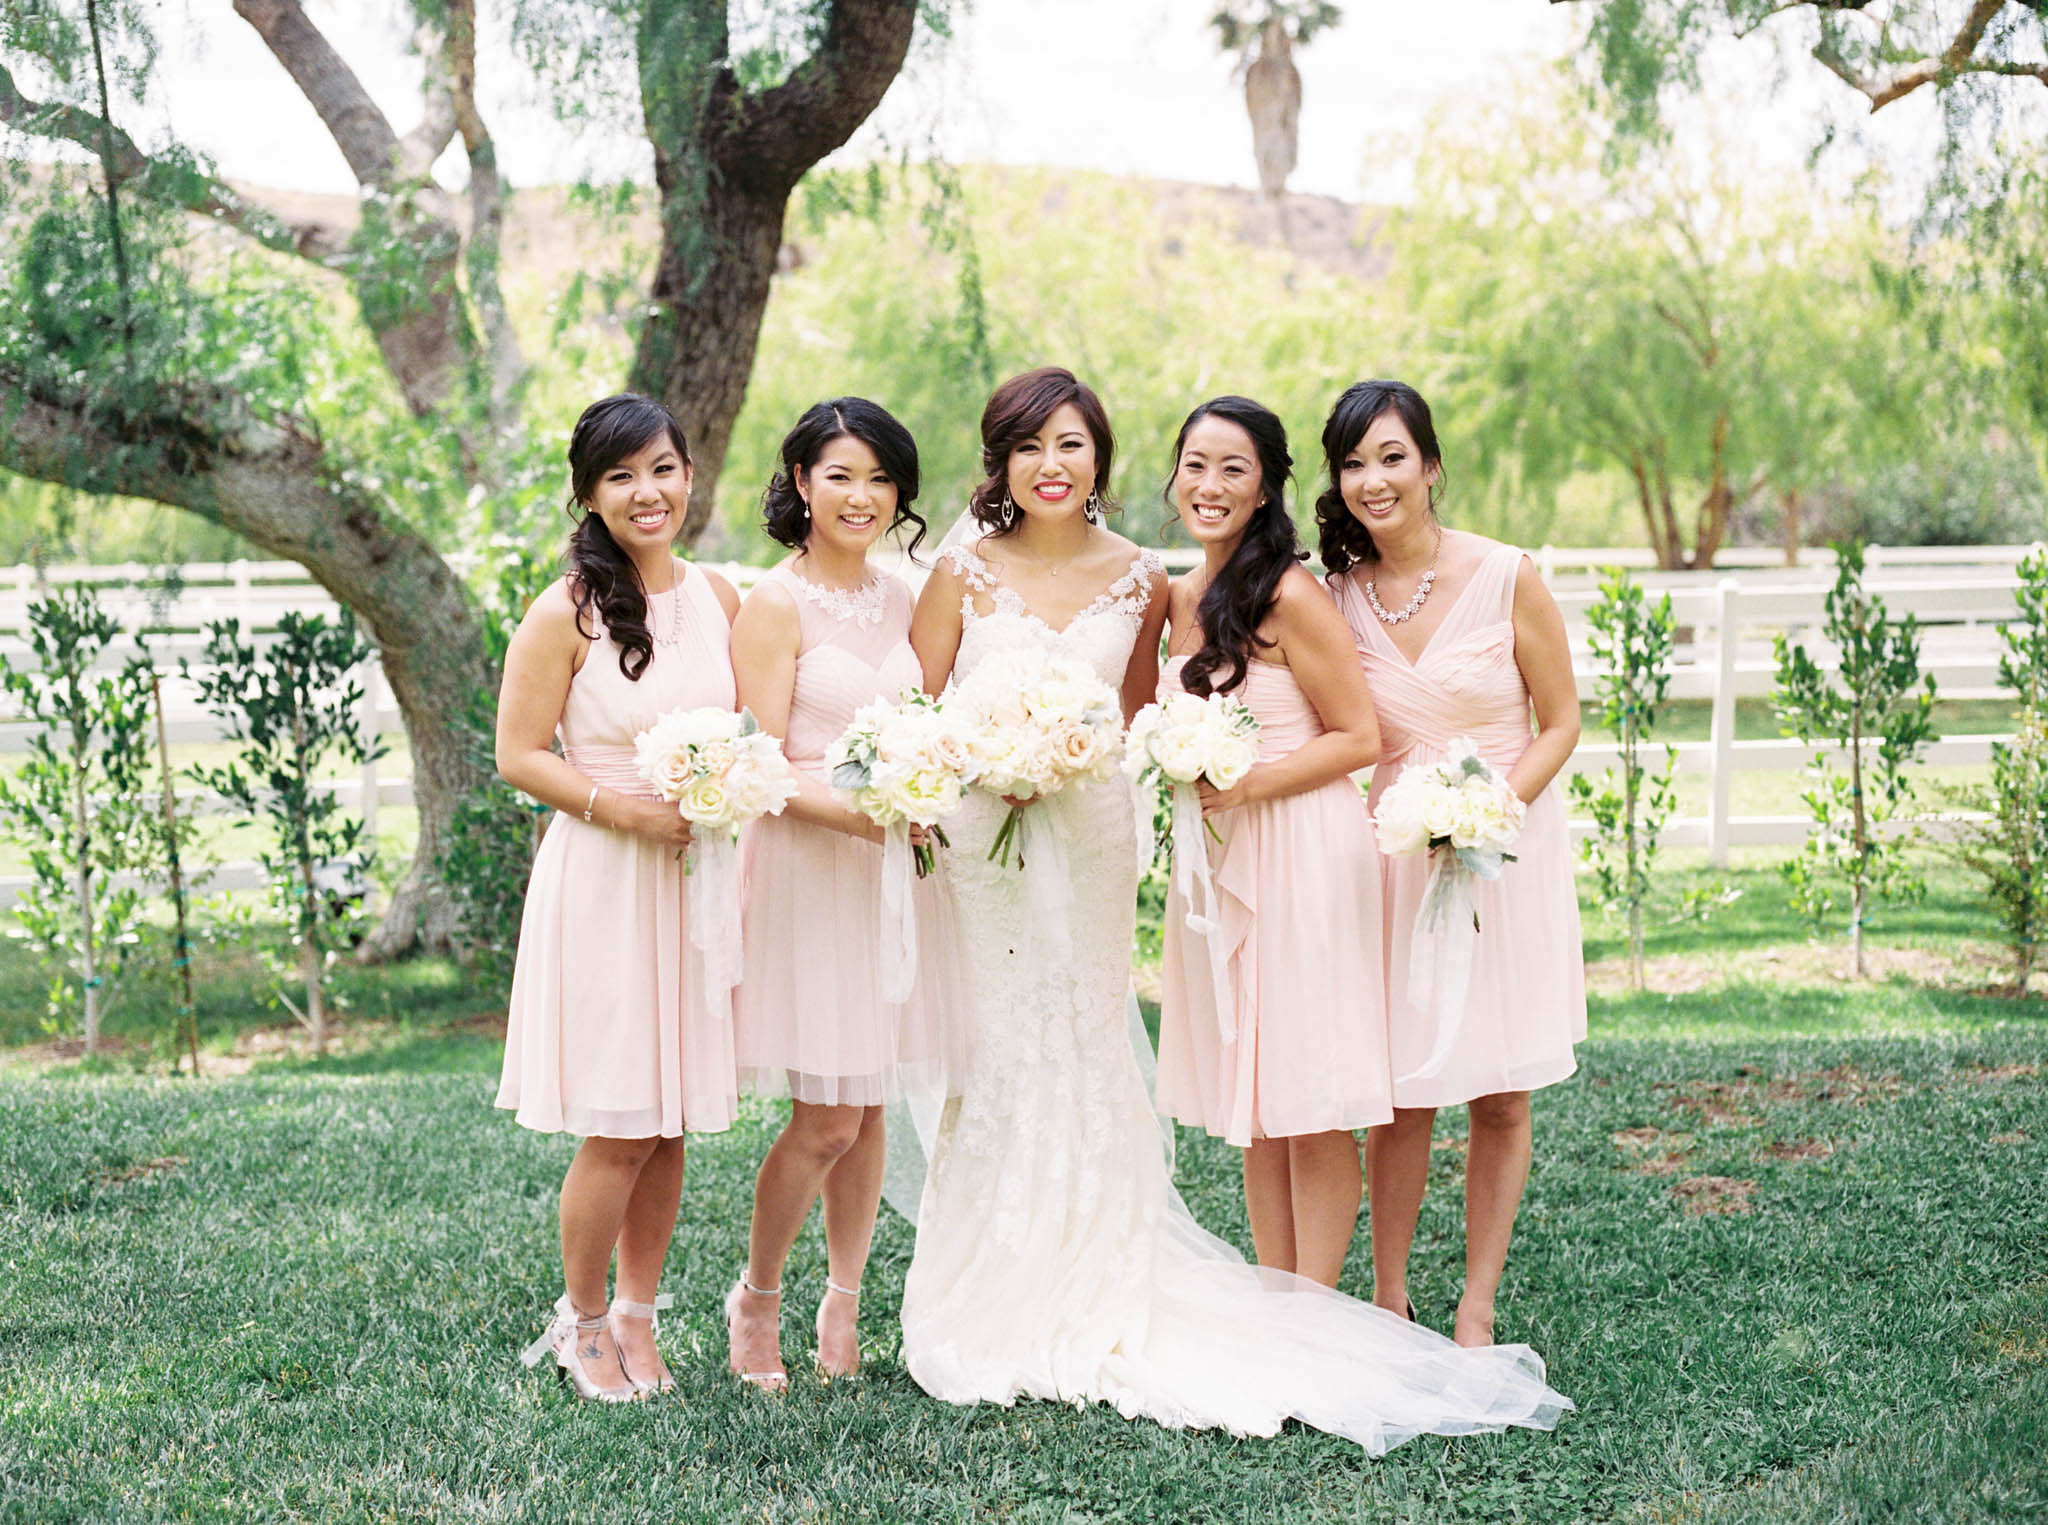 teresa-issac-wedding-163.jpg